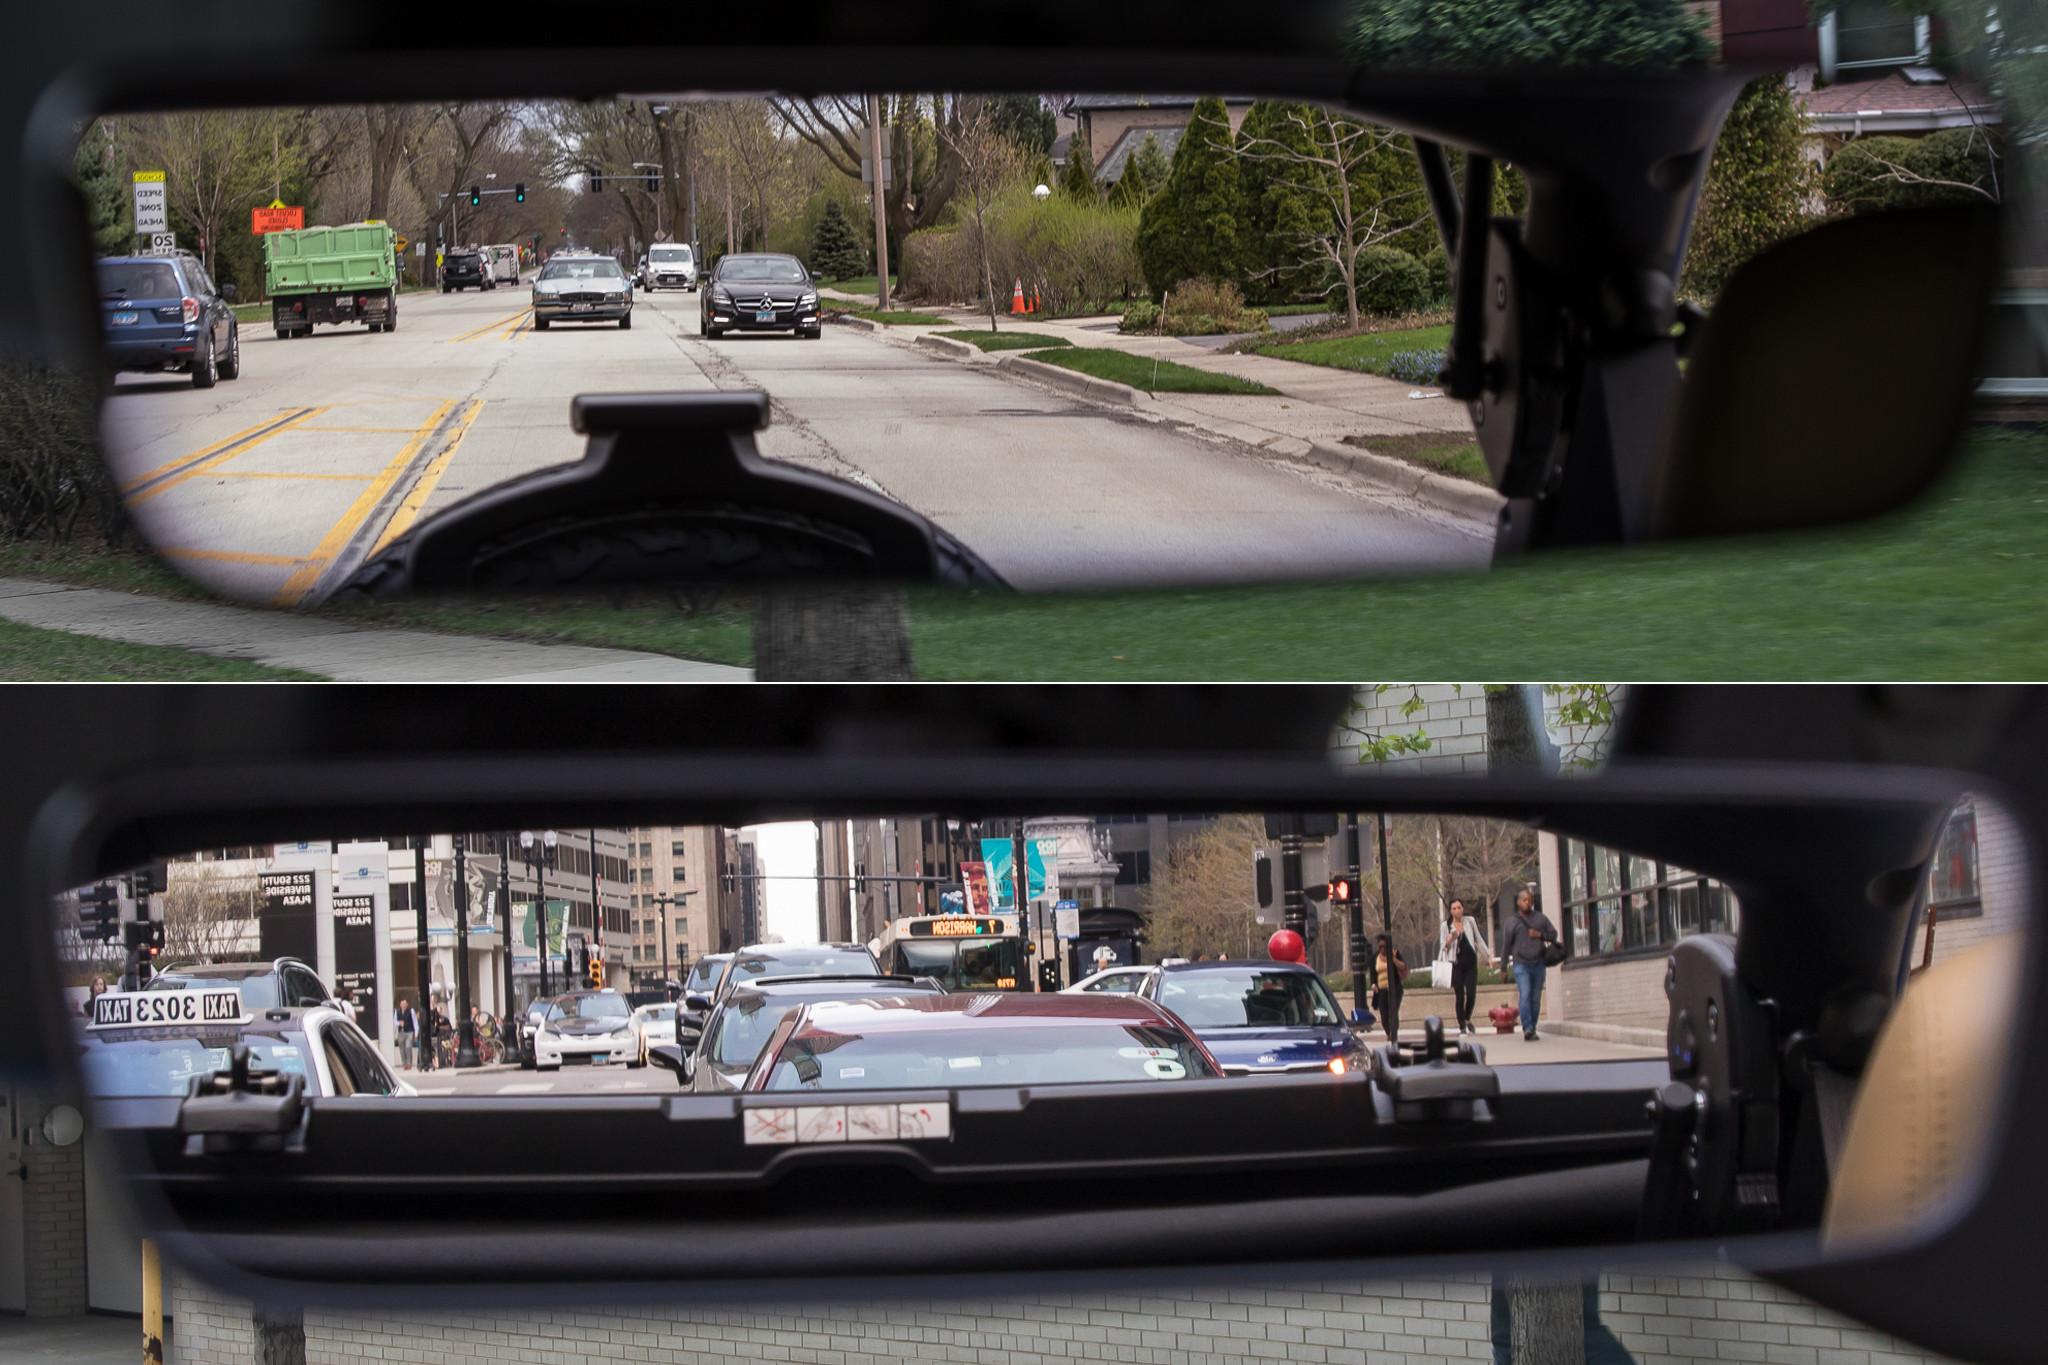 05-jeep-wrangler-2019-interior--visibility.jpg